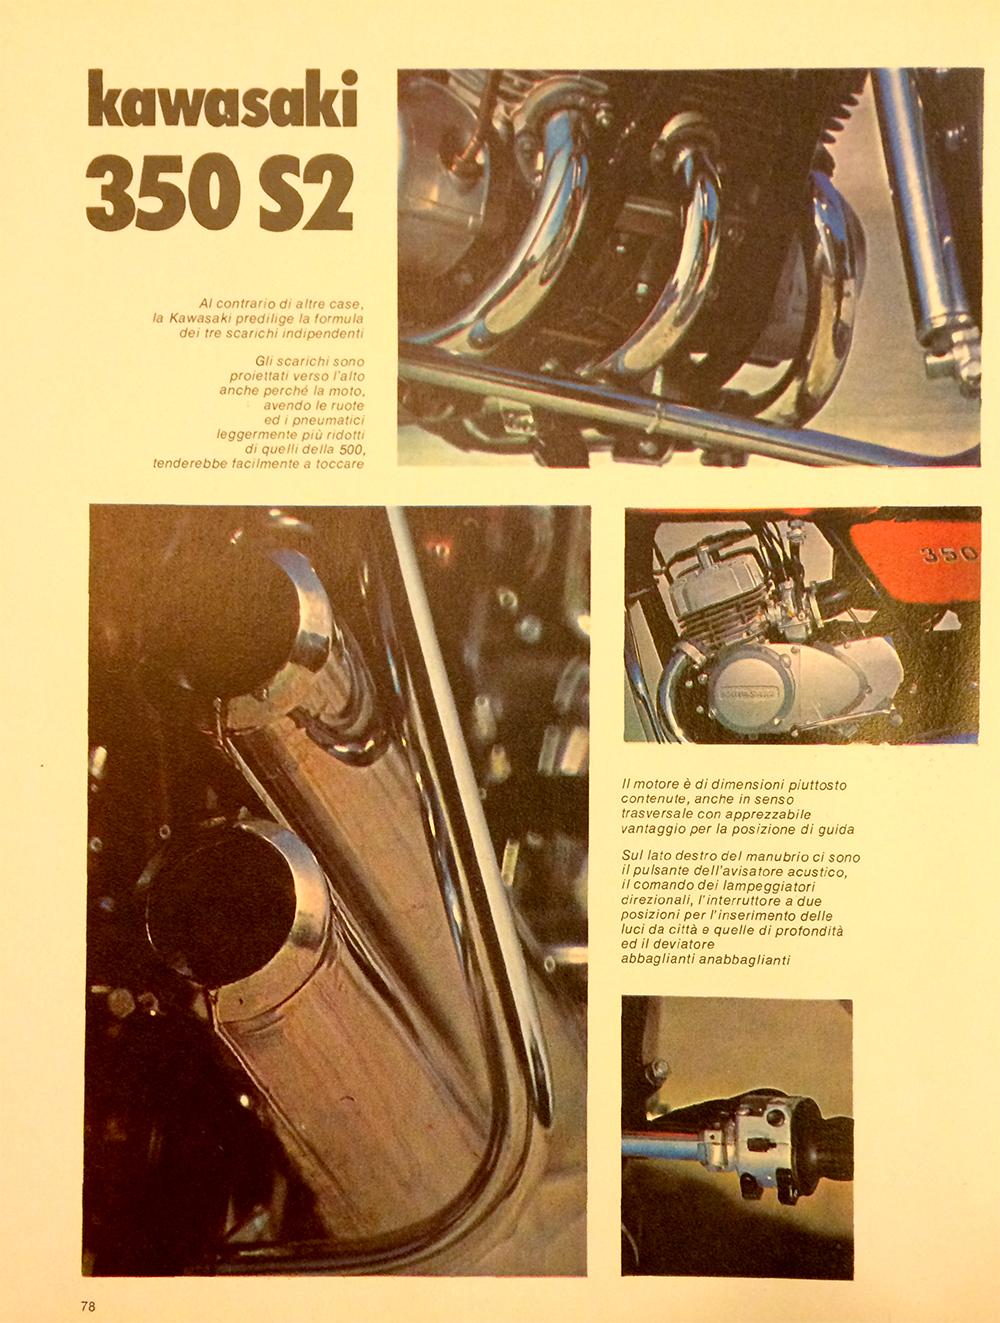 1971 Kawasaki 350 S2 Italy road test 06.jpg